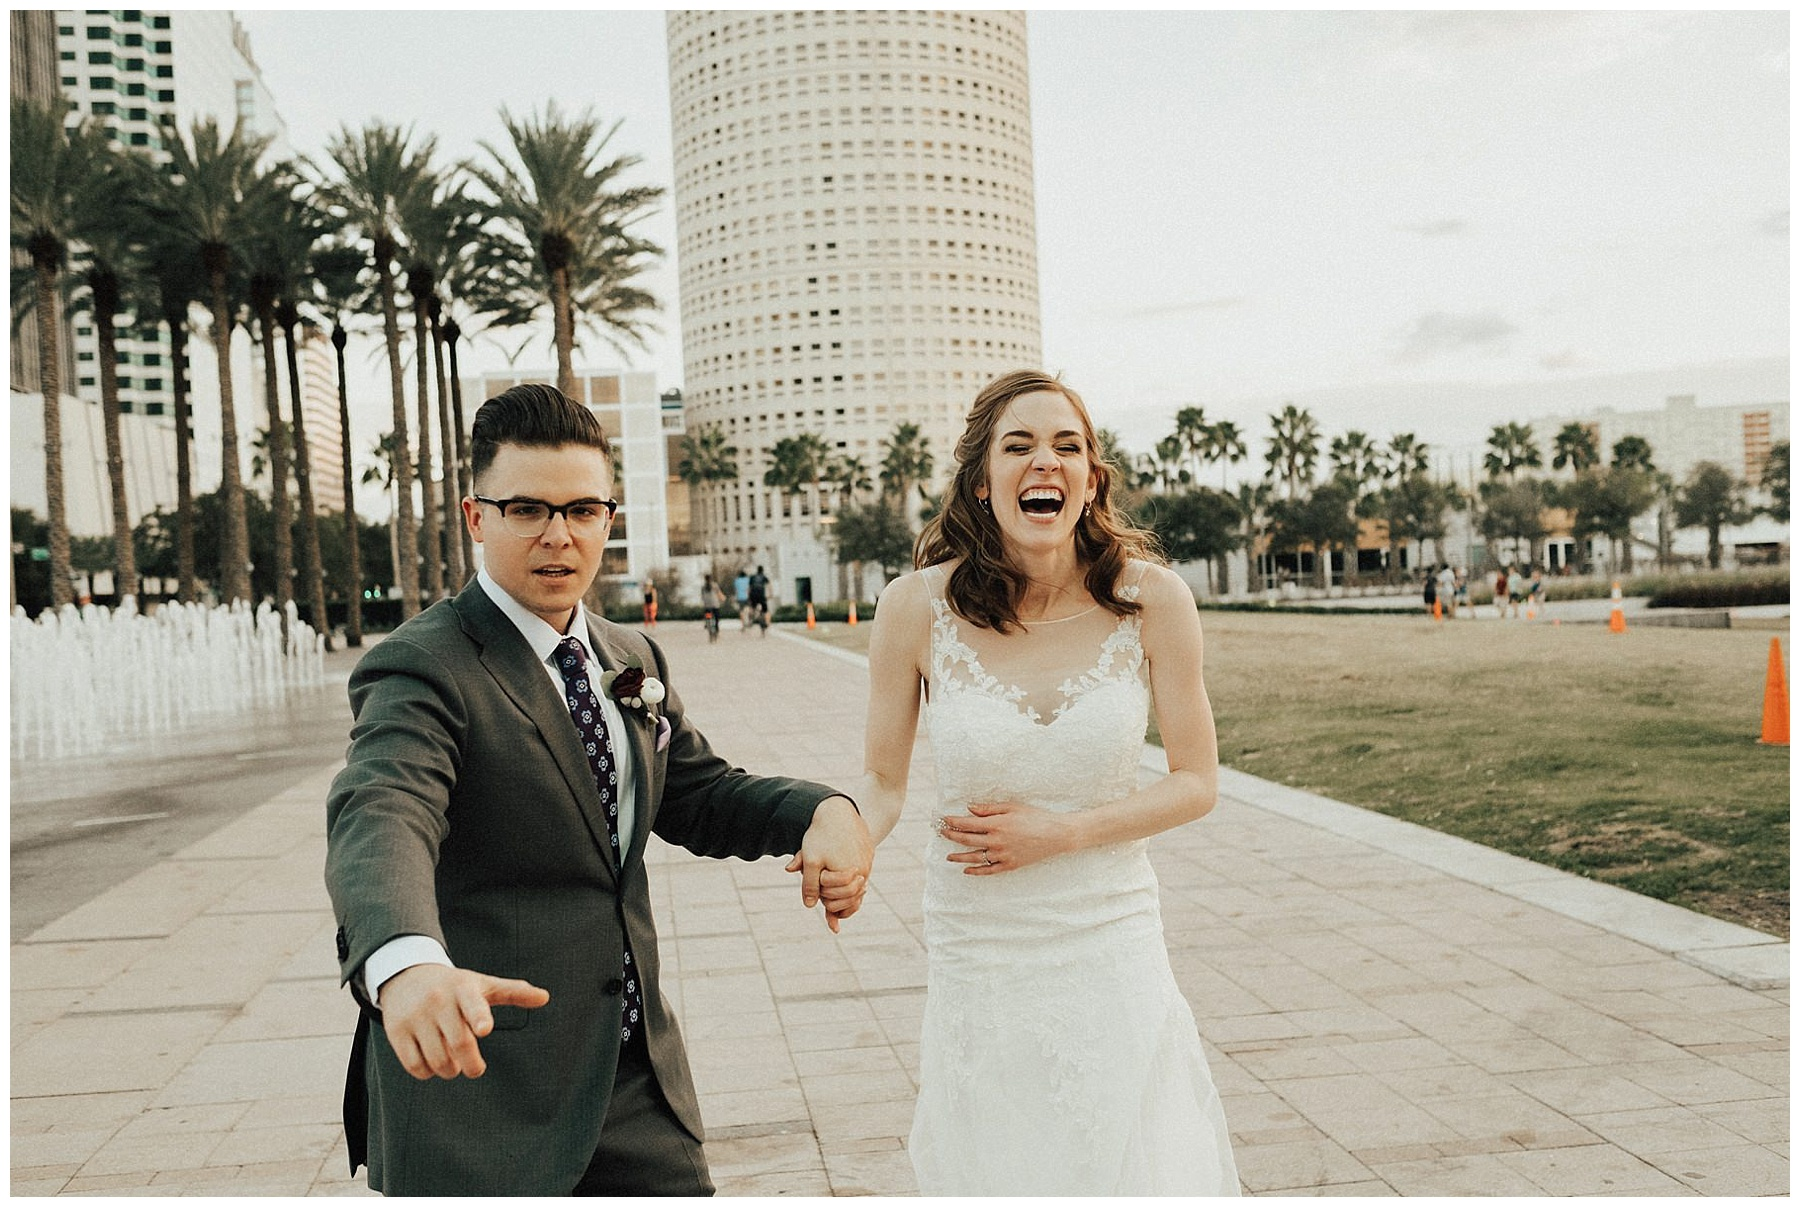 Kylie Garden Wedding Tampa Wedding Photographer-102.jpg